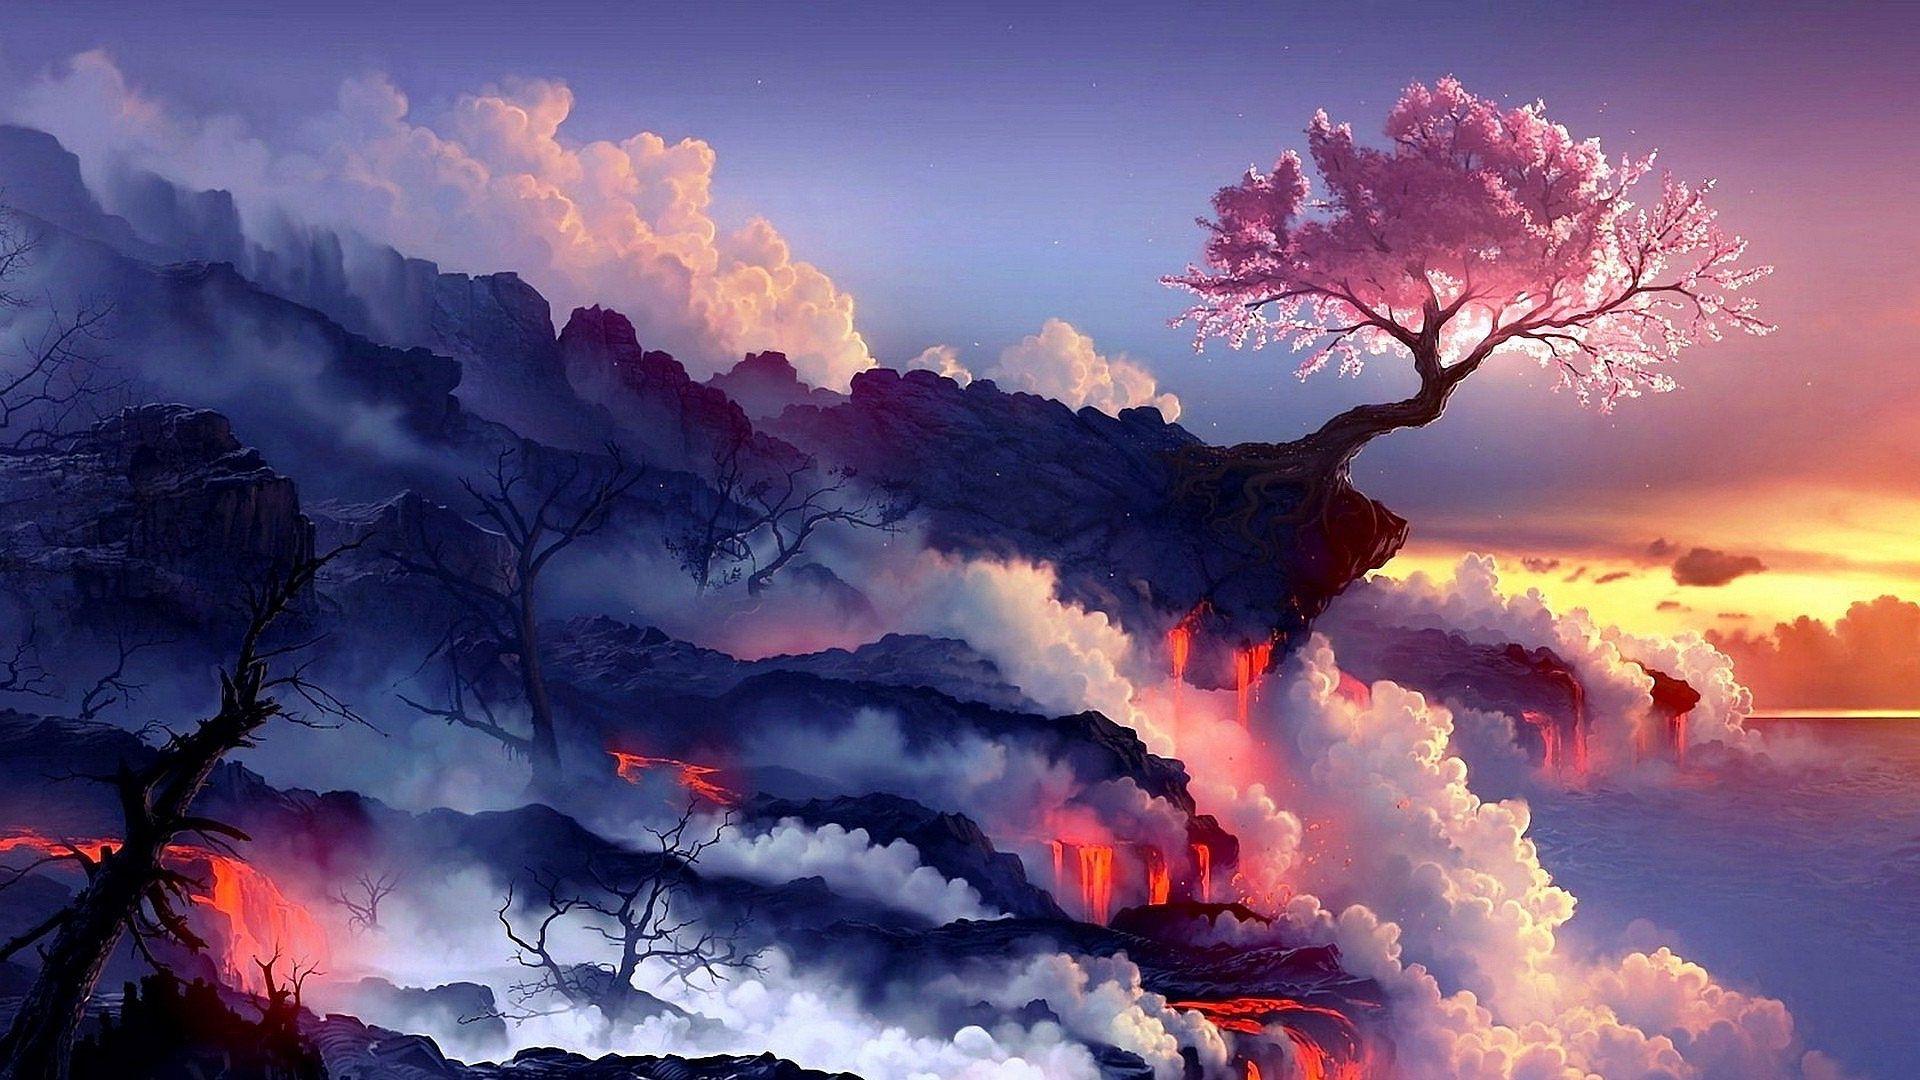 Digital Art Background full hd wallpaper download